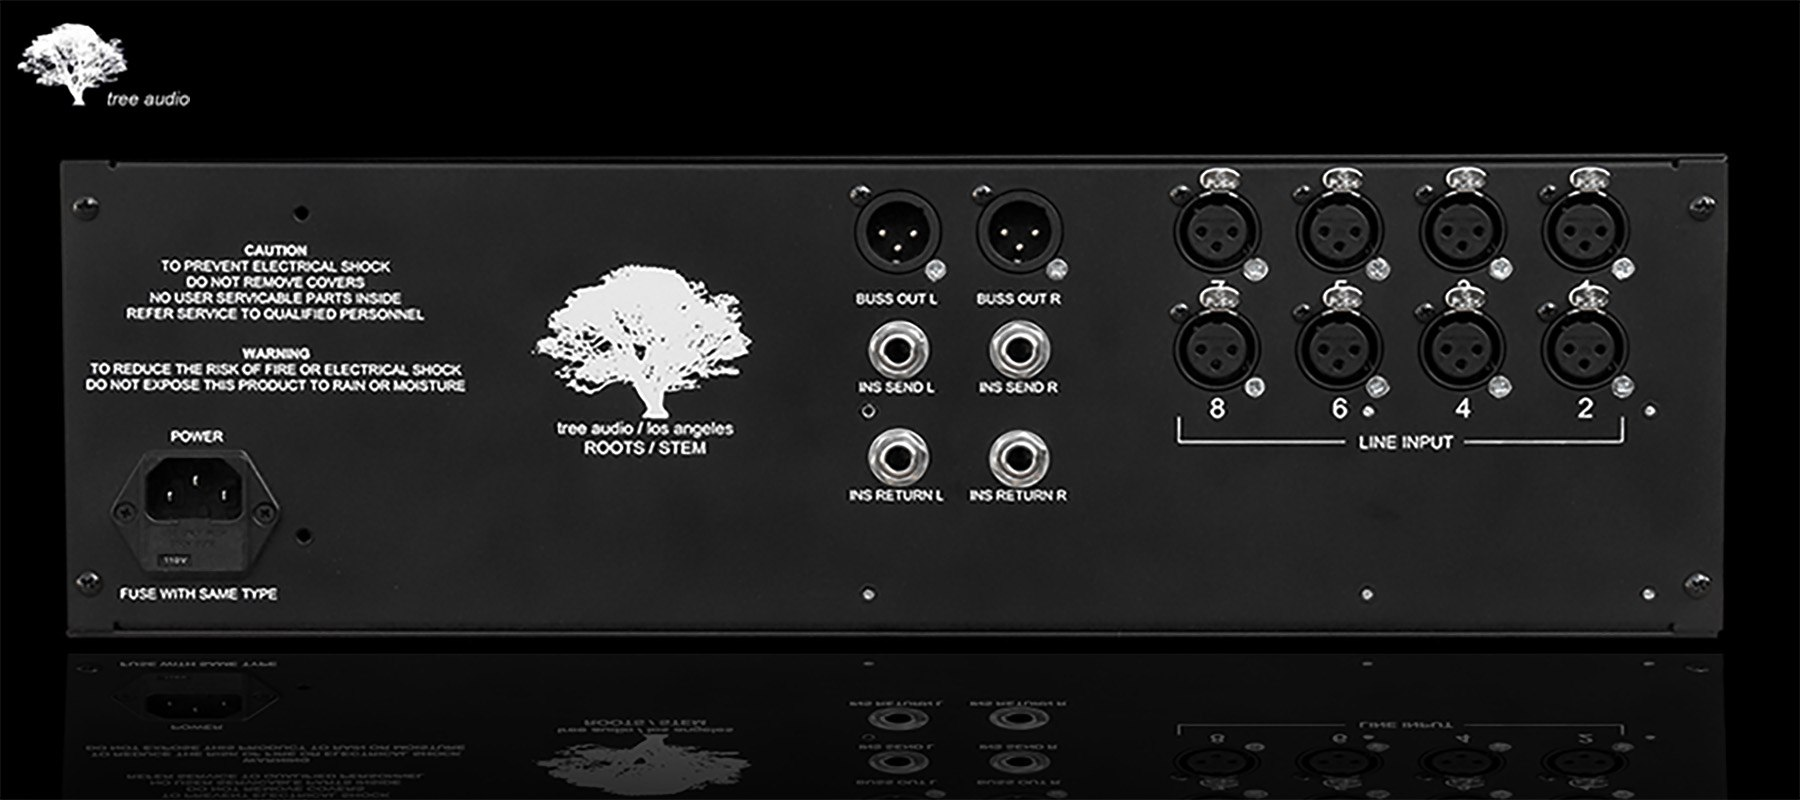 Tree Audio The Stem - Arrière